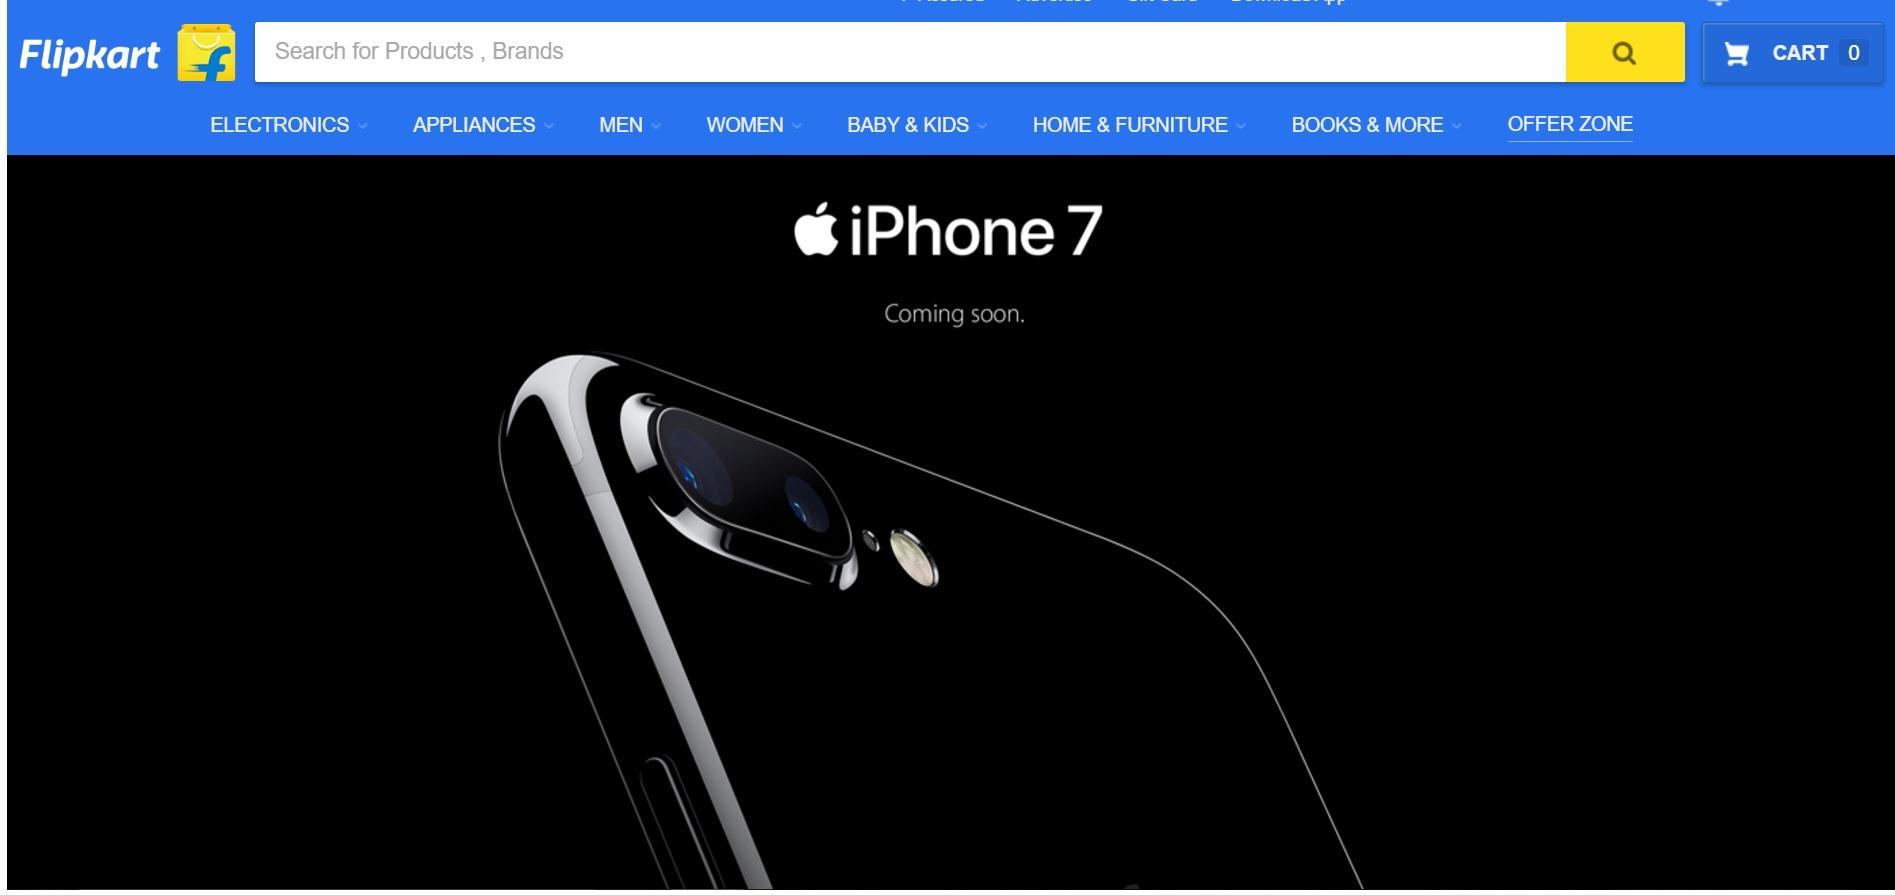 Flipkart-Apple-iPhone